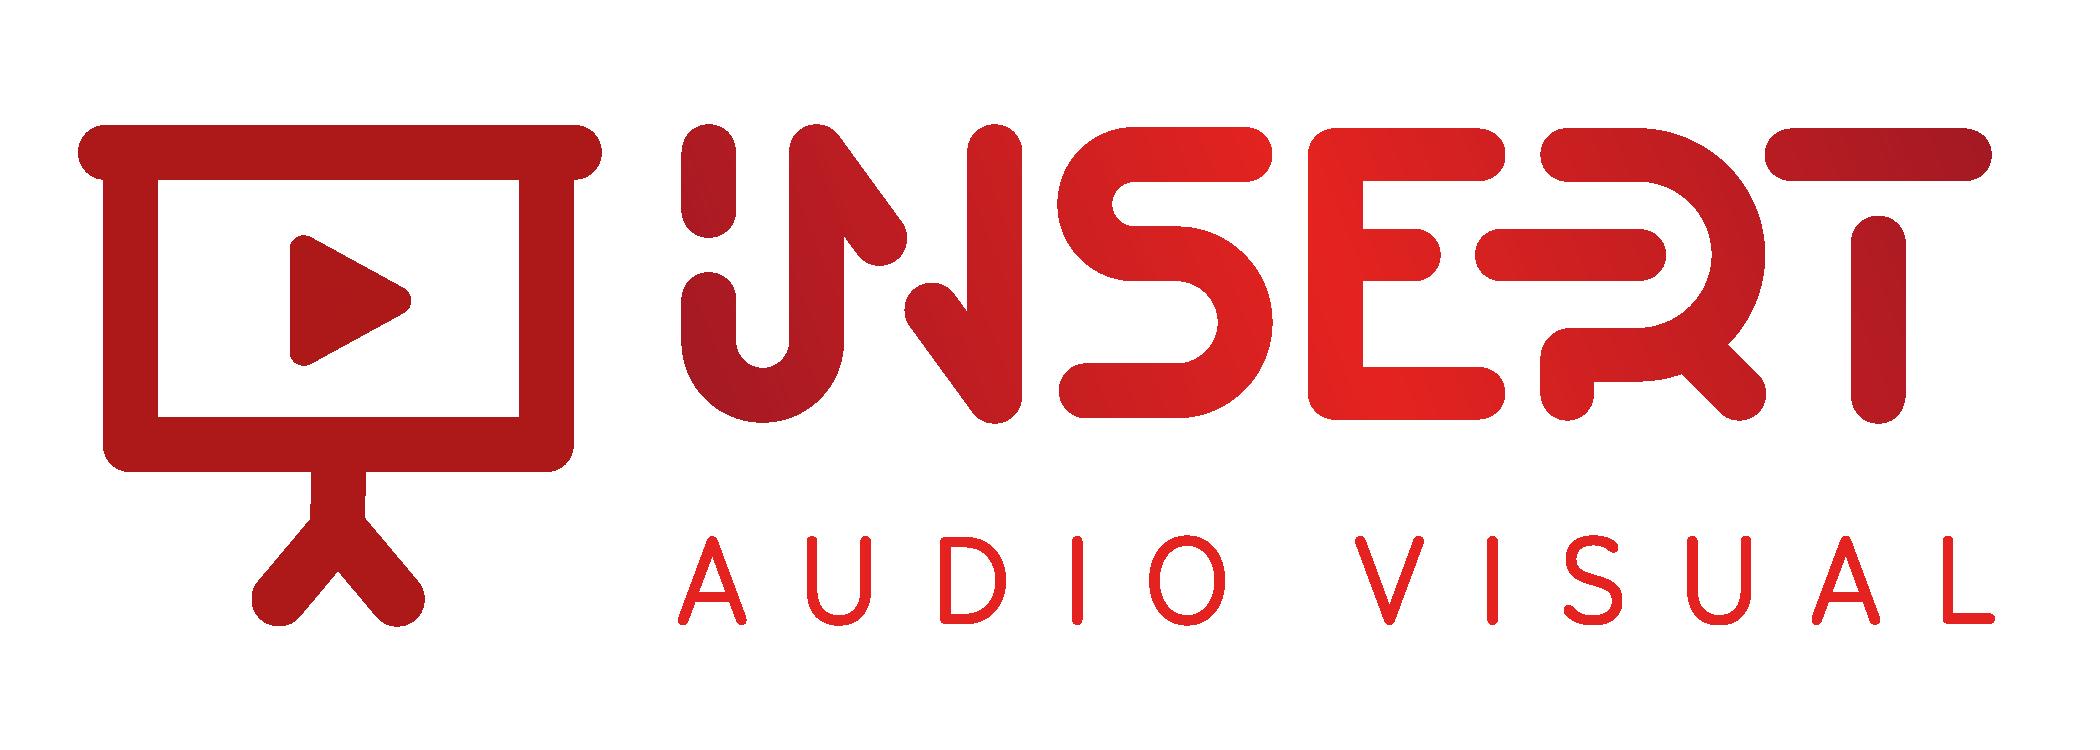 insert audio visual rebranding logo